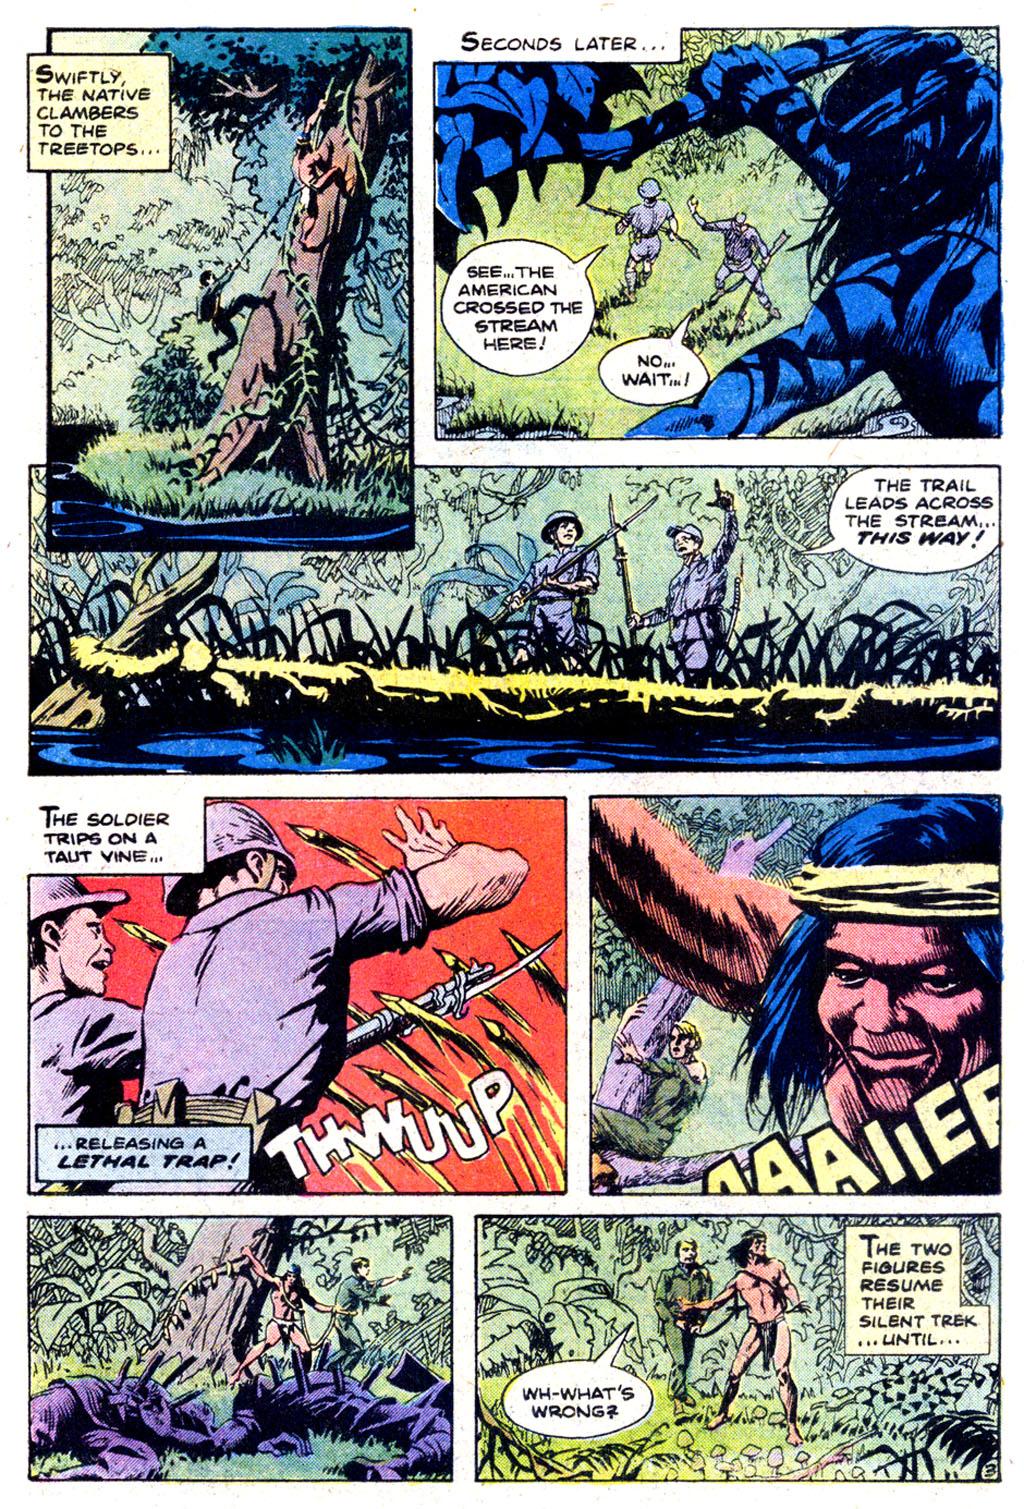 Read online Sgt. Rock comic -  Issue #340 - 16